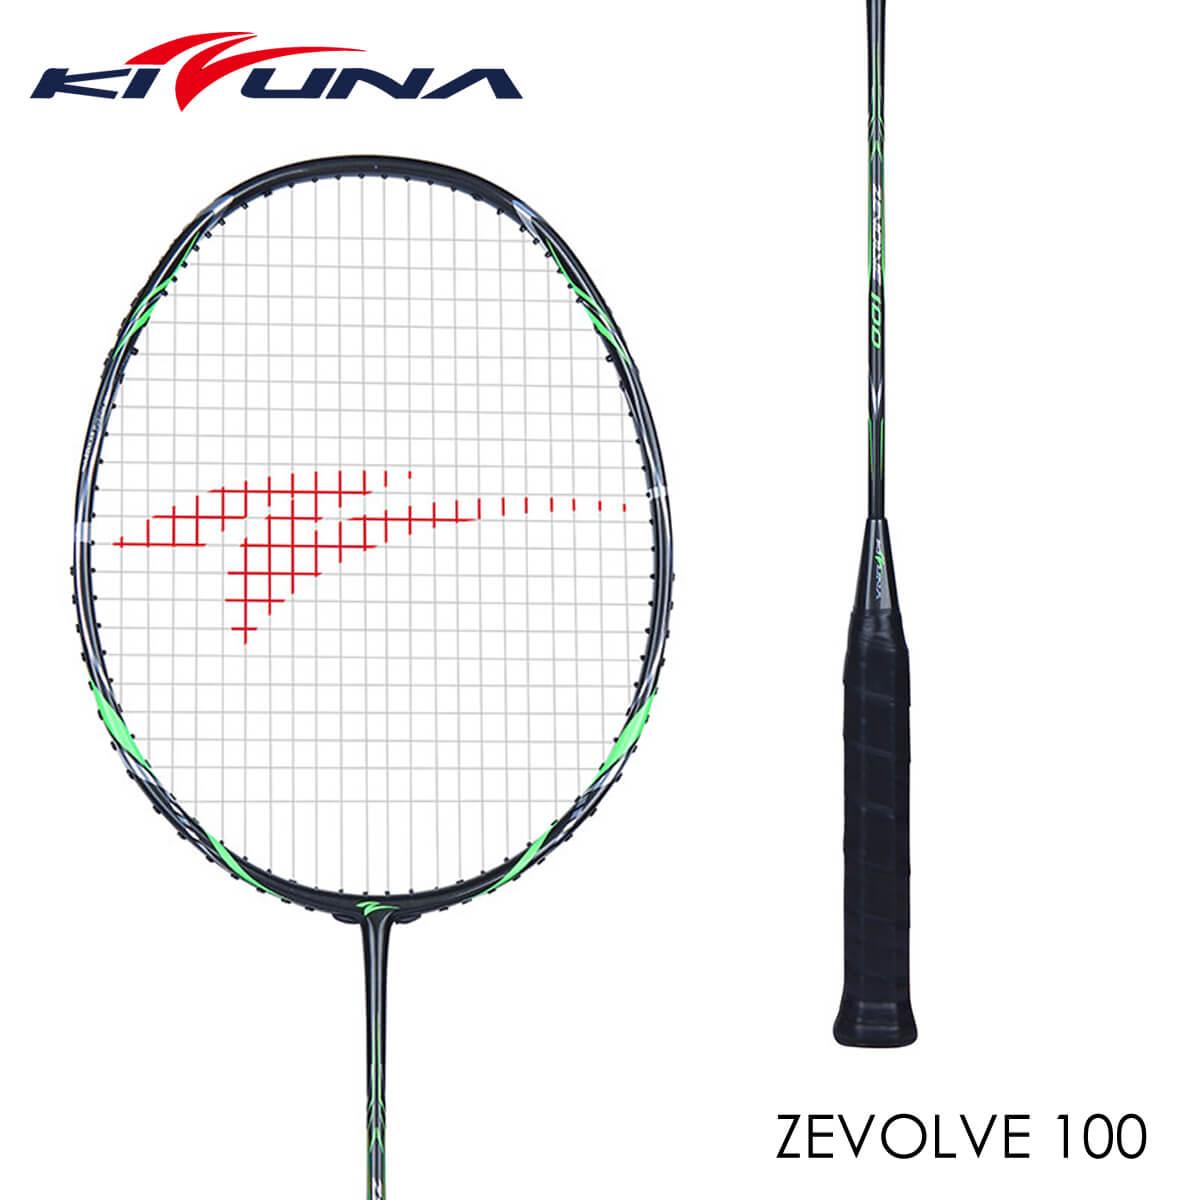 KIZUNA Z100 ZEVOLVE 100 バドミントンラケット キズナ【ガット張り工賃無料/ 取り寄せ】